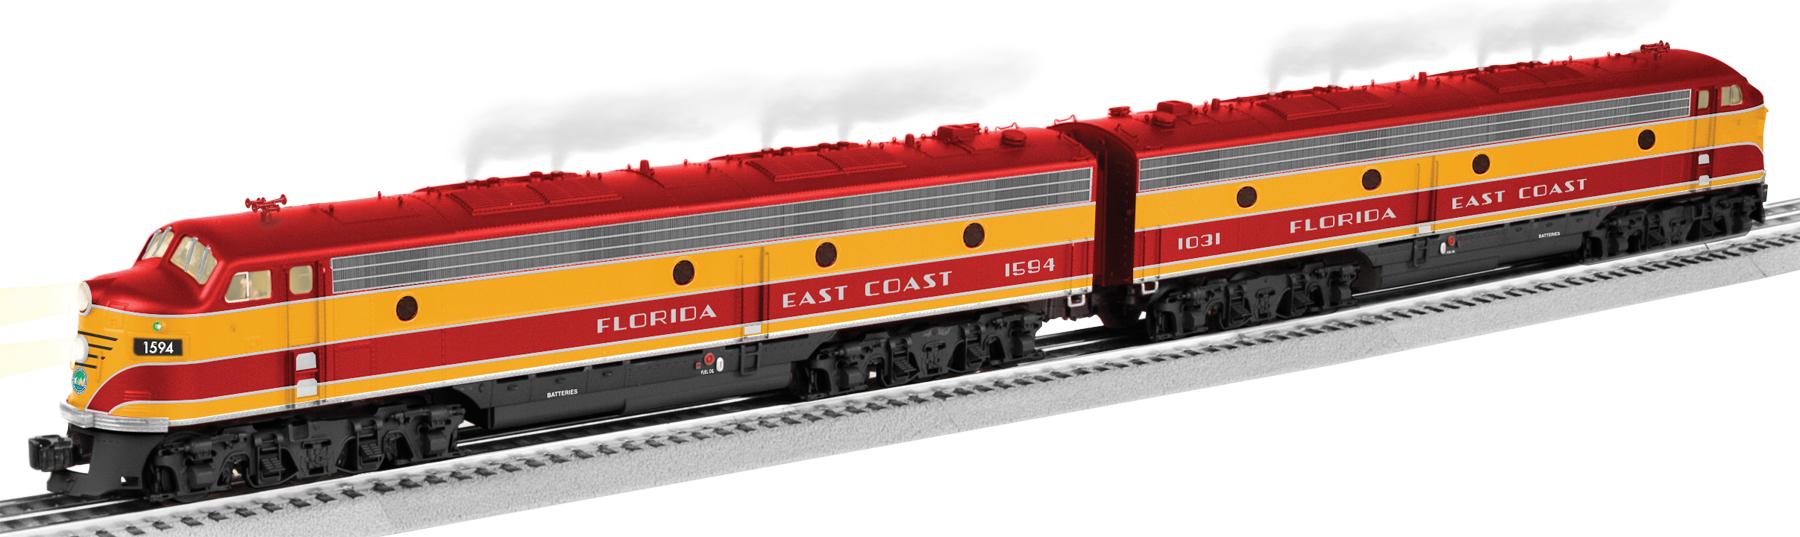 East Coast Diesel >> Florida East Coast Legacy Scale E9 A A Diesel